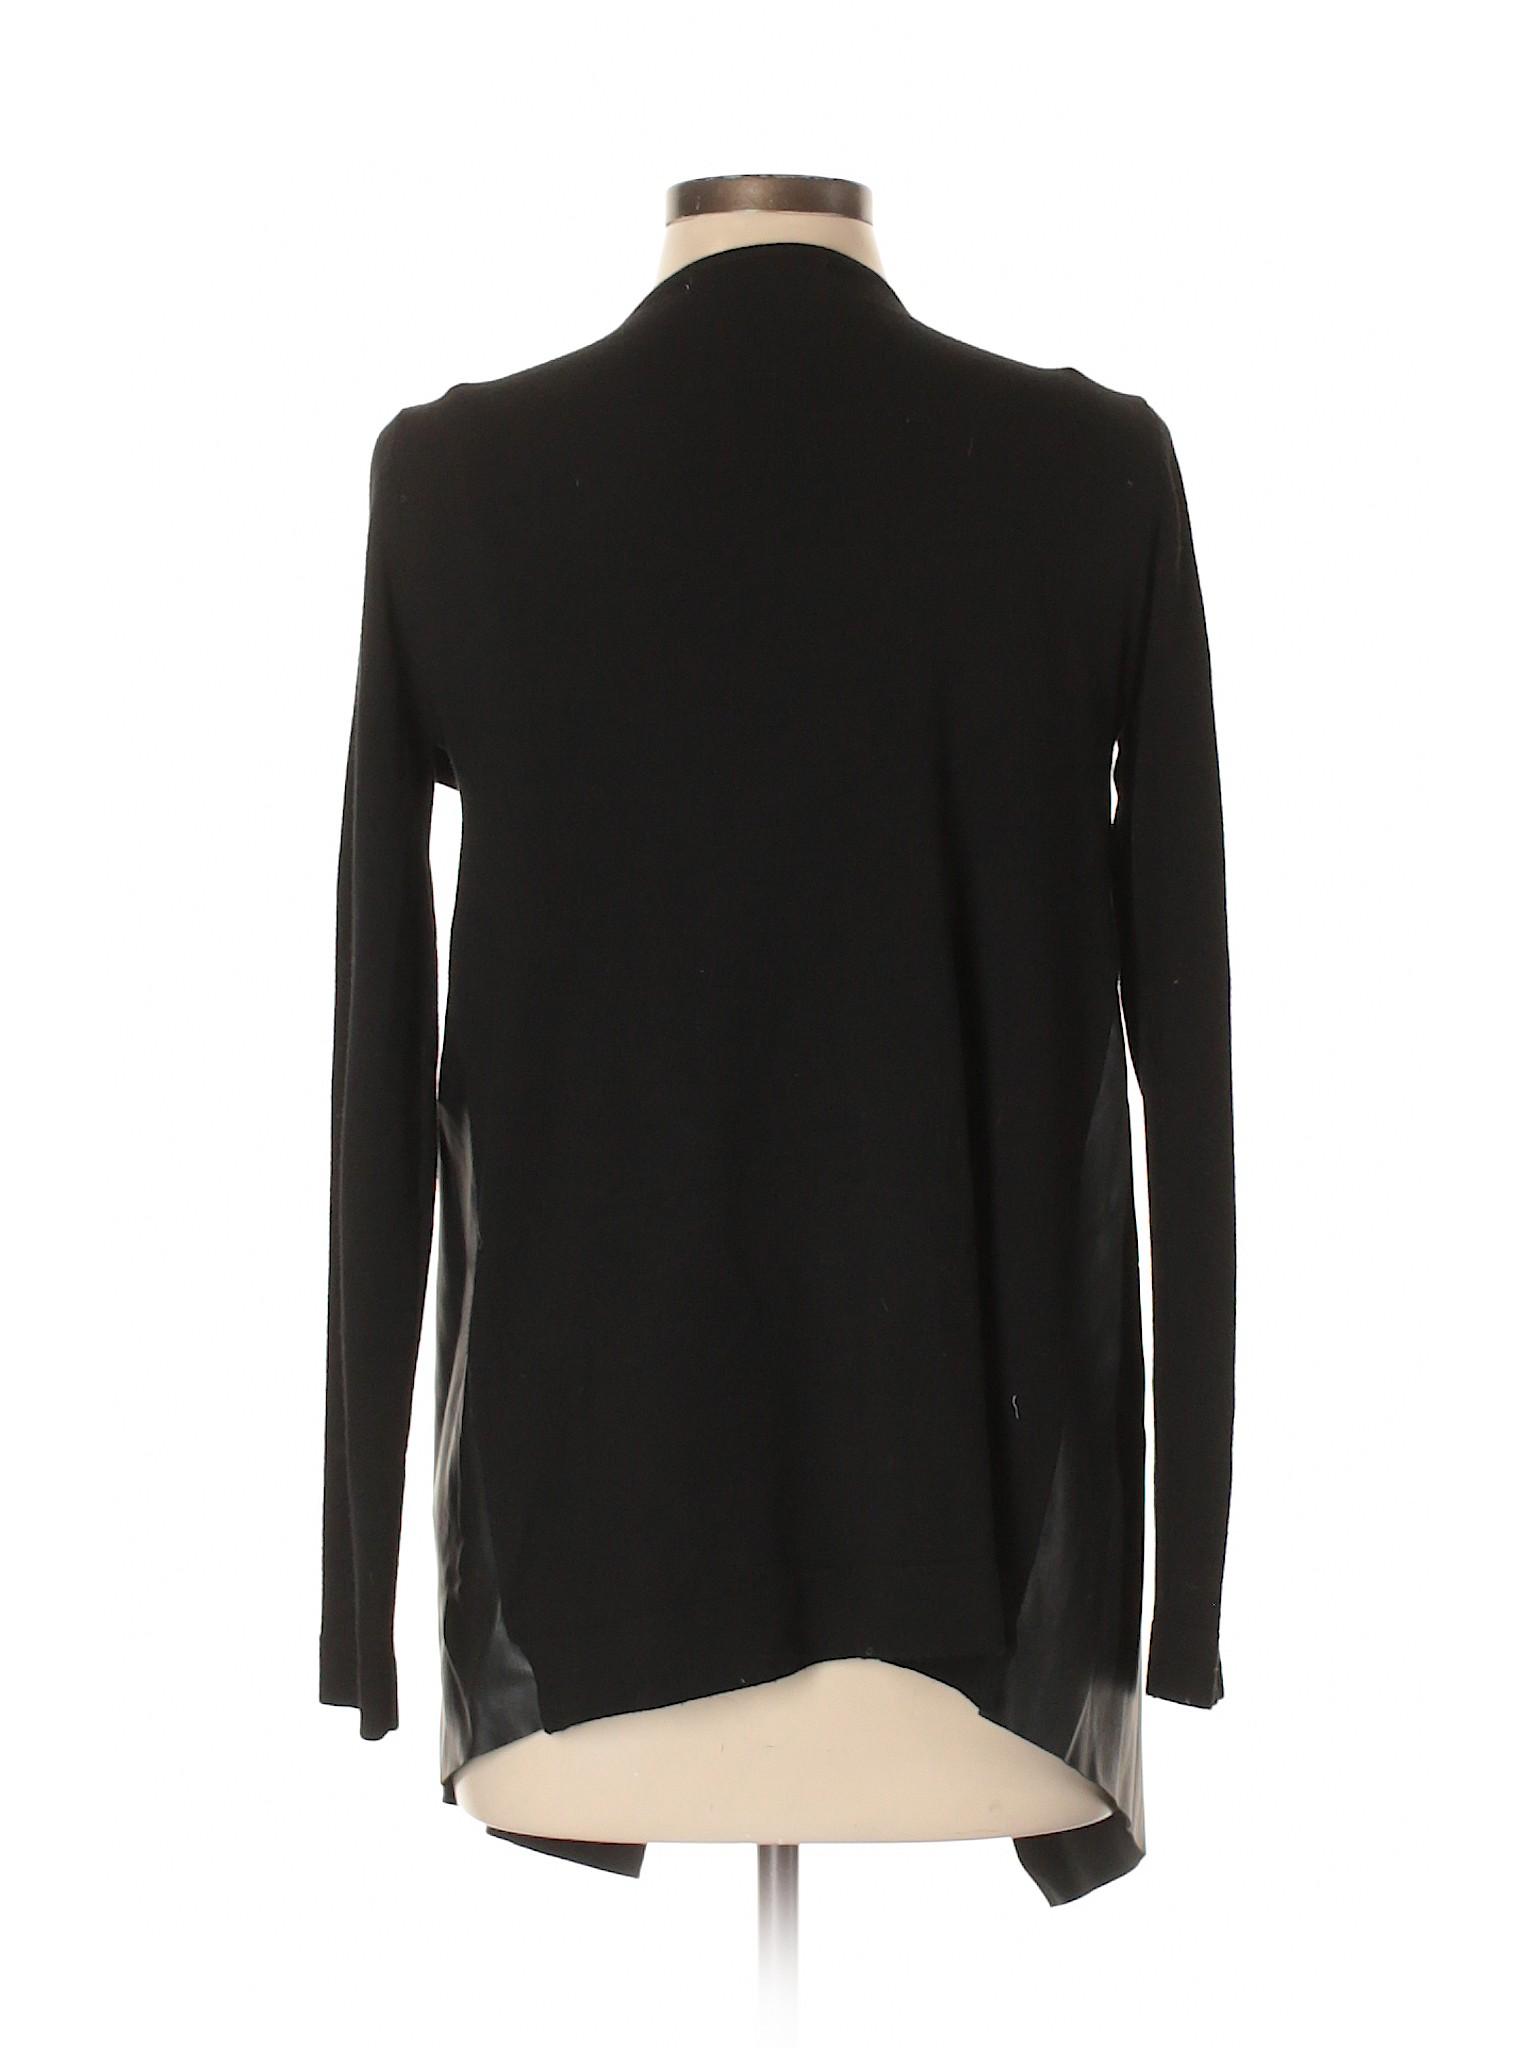 Boutique Zara Zara Boutique Cardigan Cardigan Boutique Zara pqZ0prw